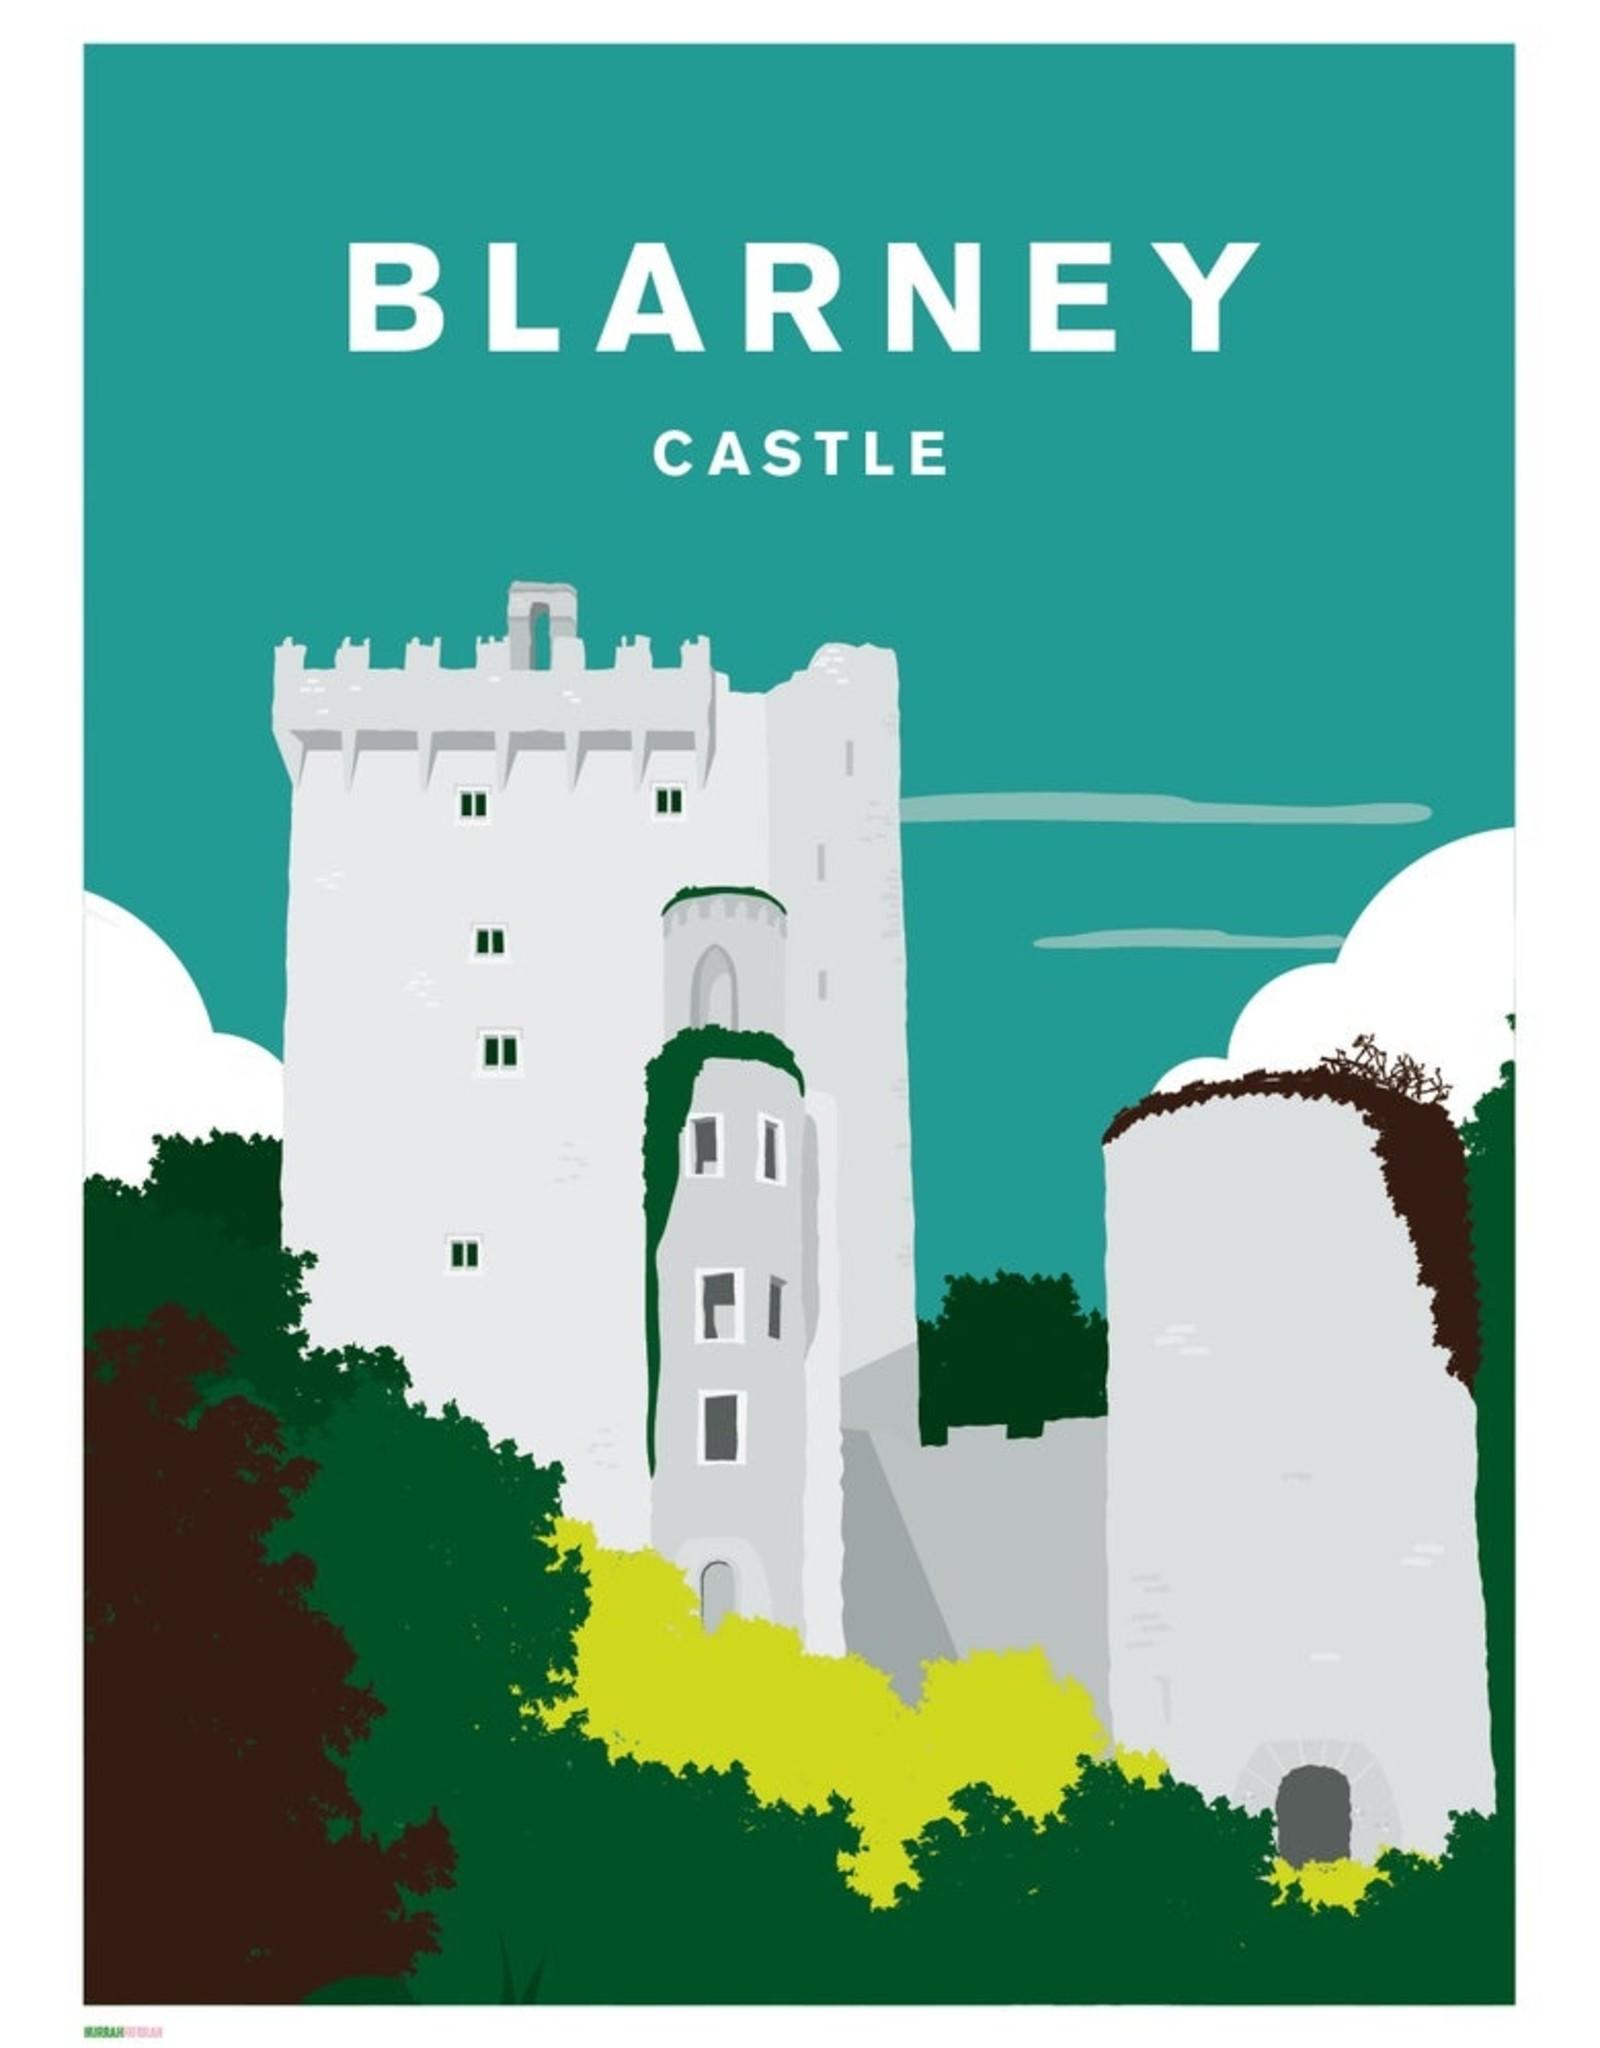 Hurrah Hurrah Hurrah Hurrah Blarney Castle